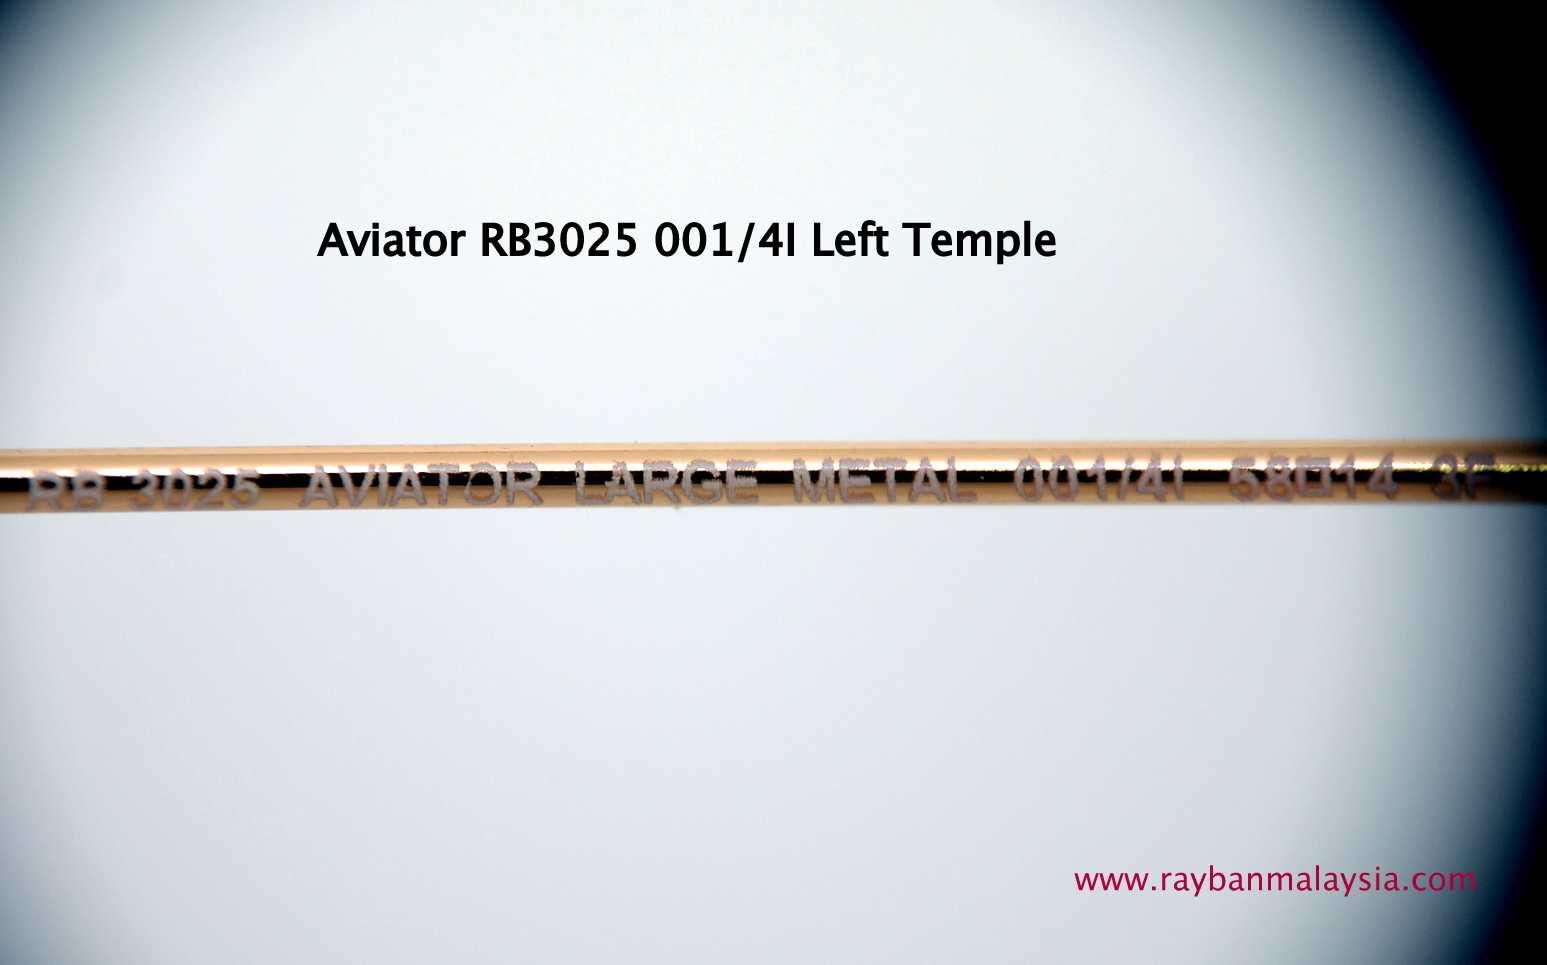 fake ray ban aviator sunglasses  genuine rayban aviator 001/4i left temple